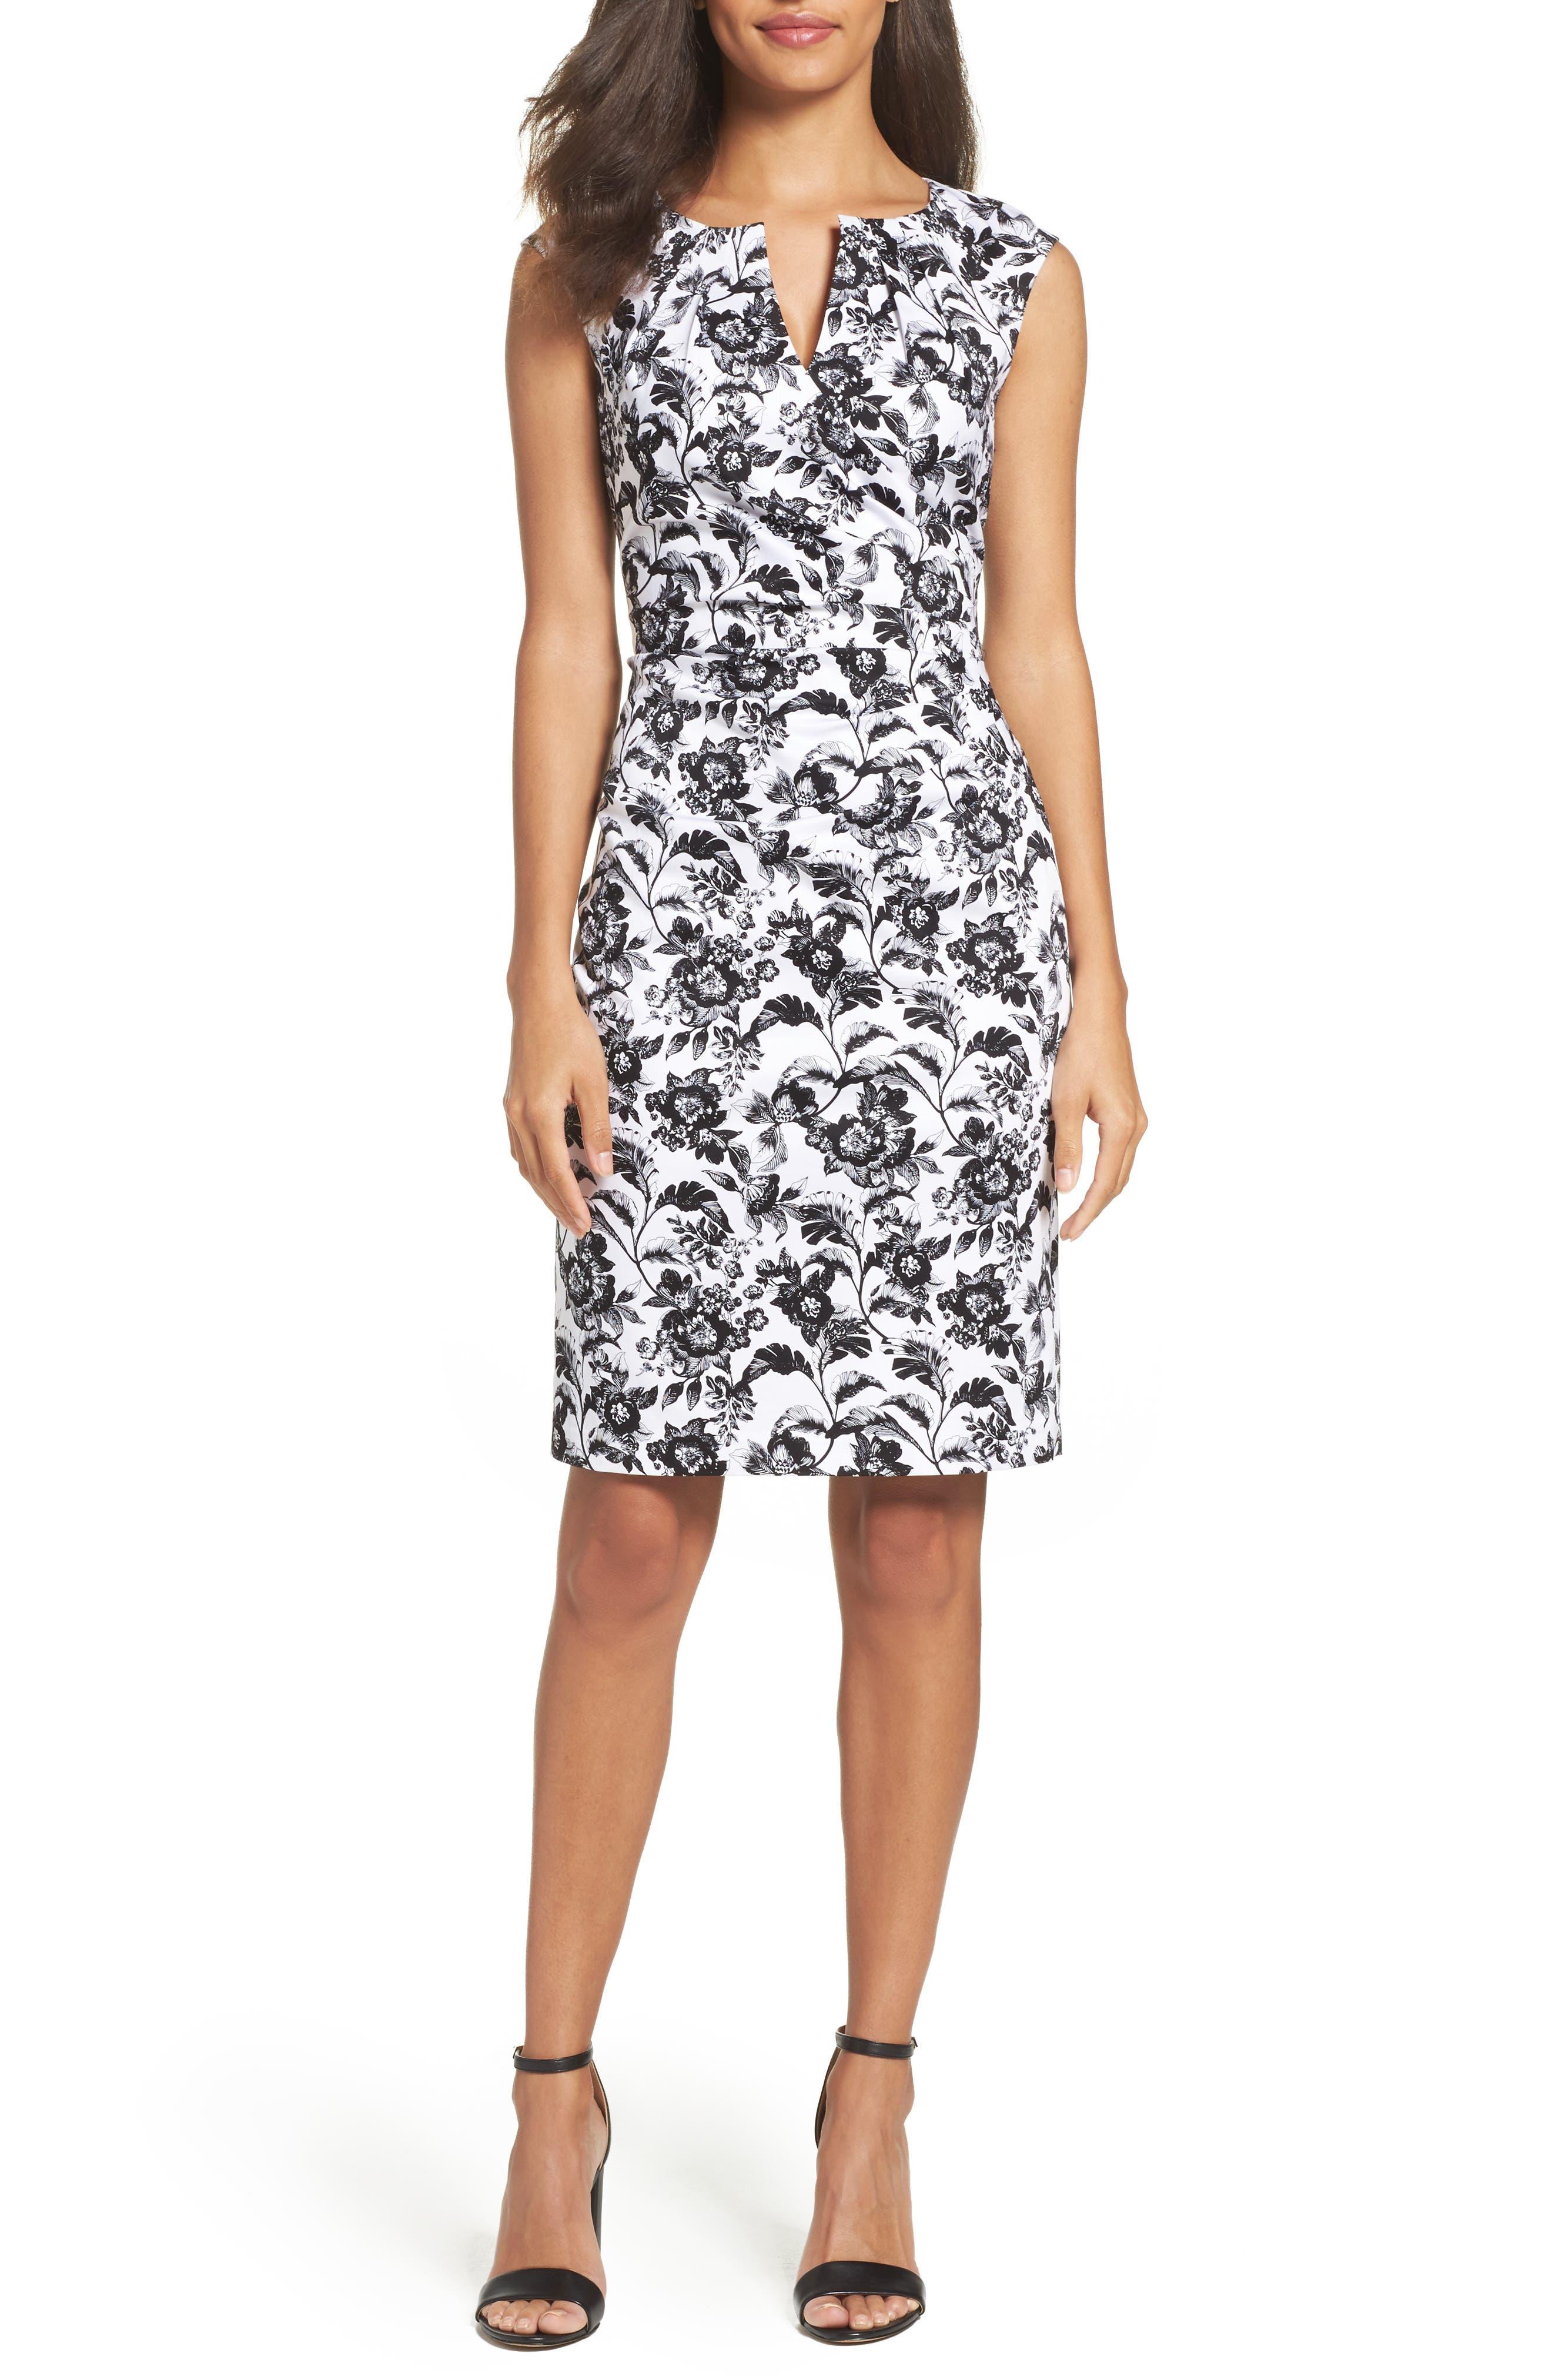 Adrianna Papell Print Sheath Dress